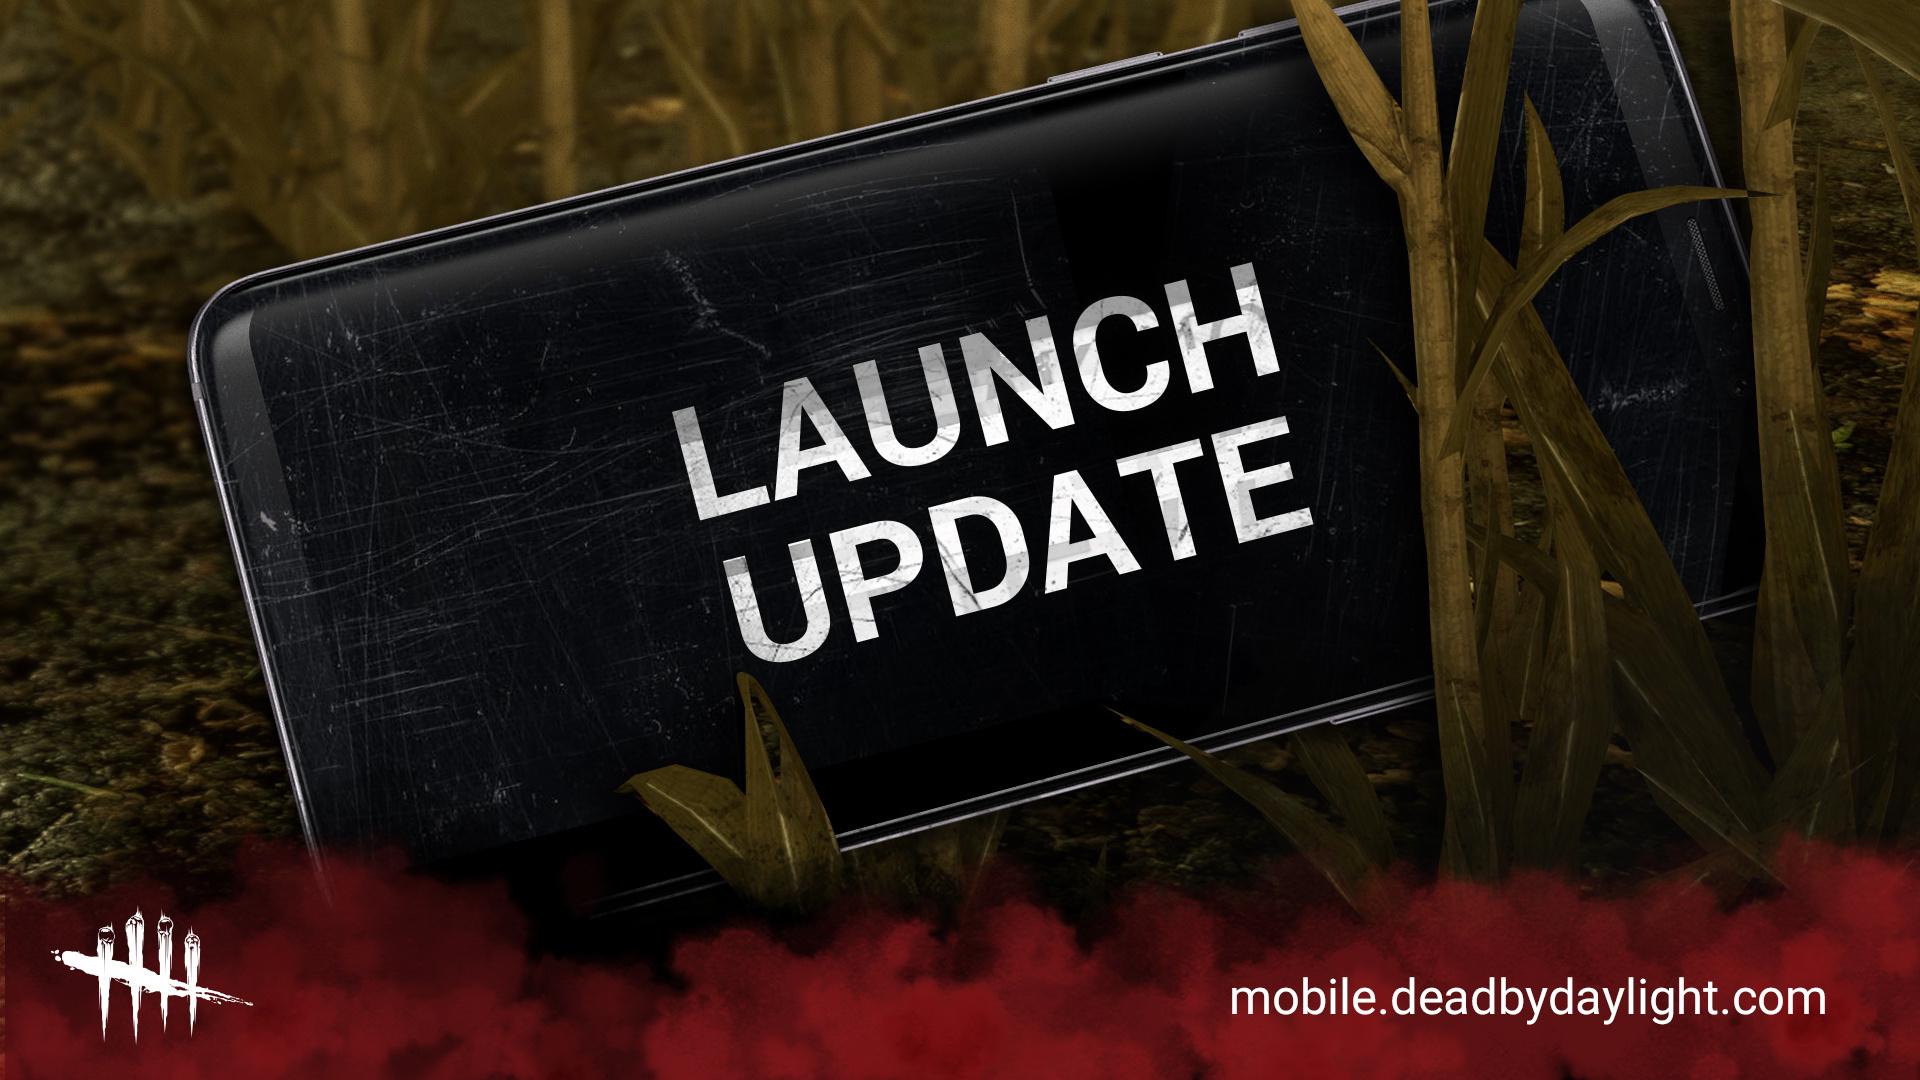 DbD-Mobile_Launch Update_FB.jpg